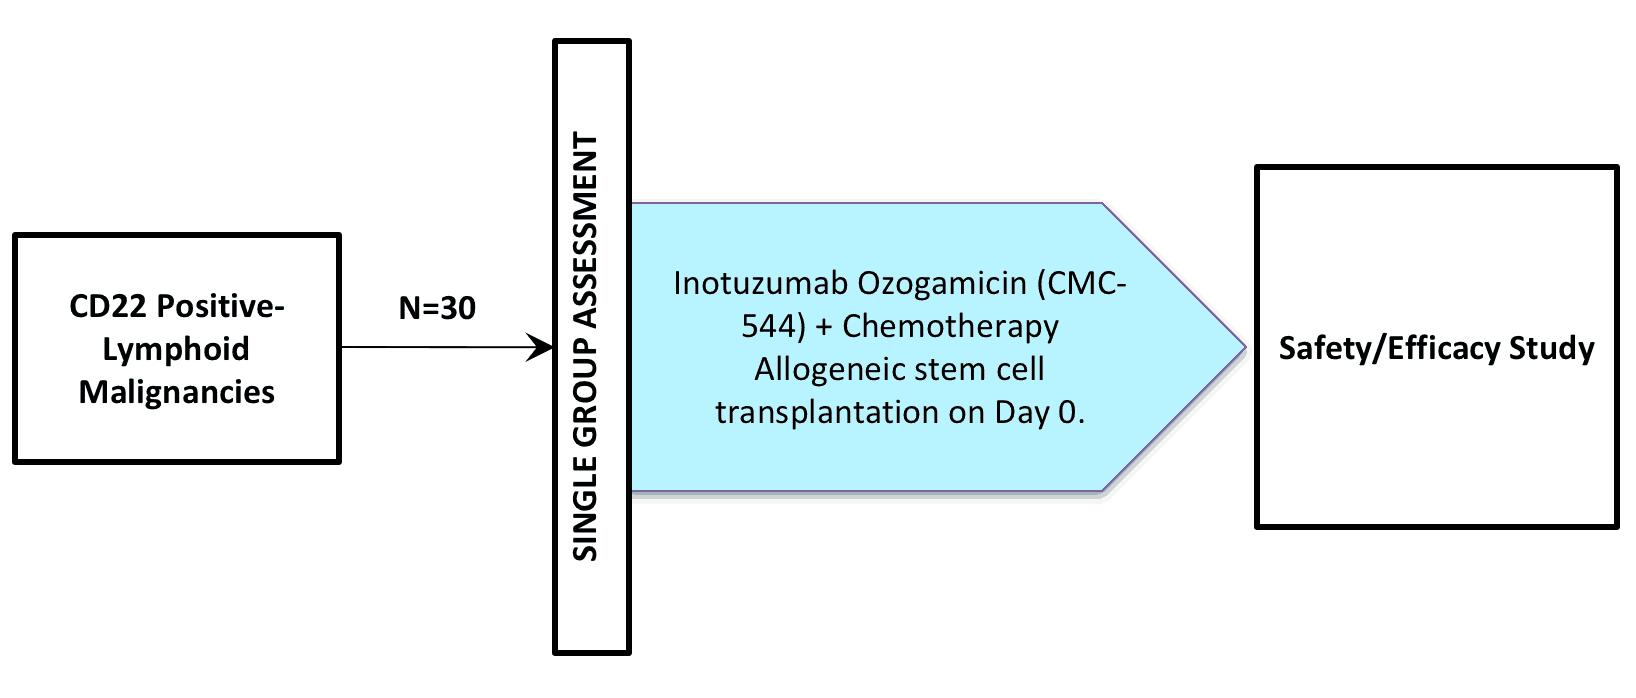 NCT01664910 (Clinical Trial / inotuzumab ozogamycin / CMC-544)